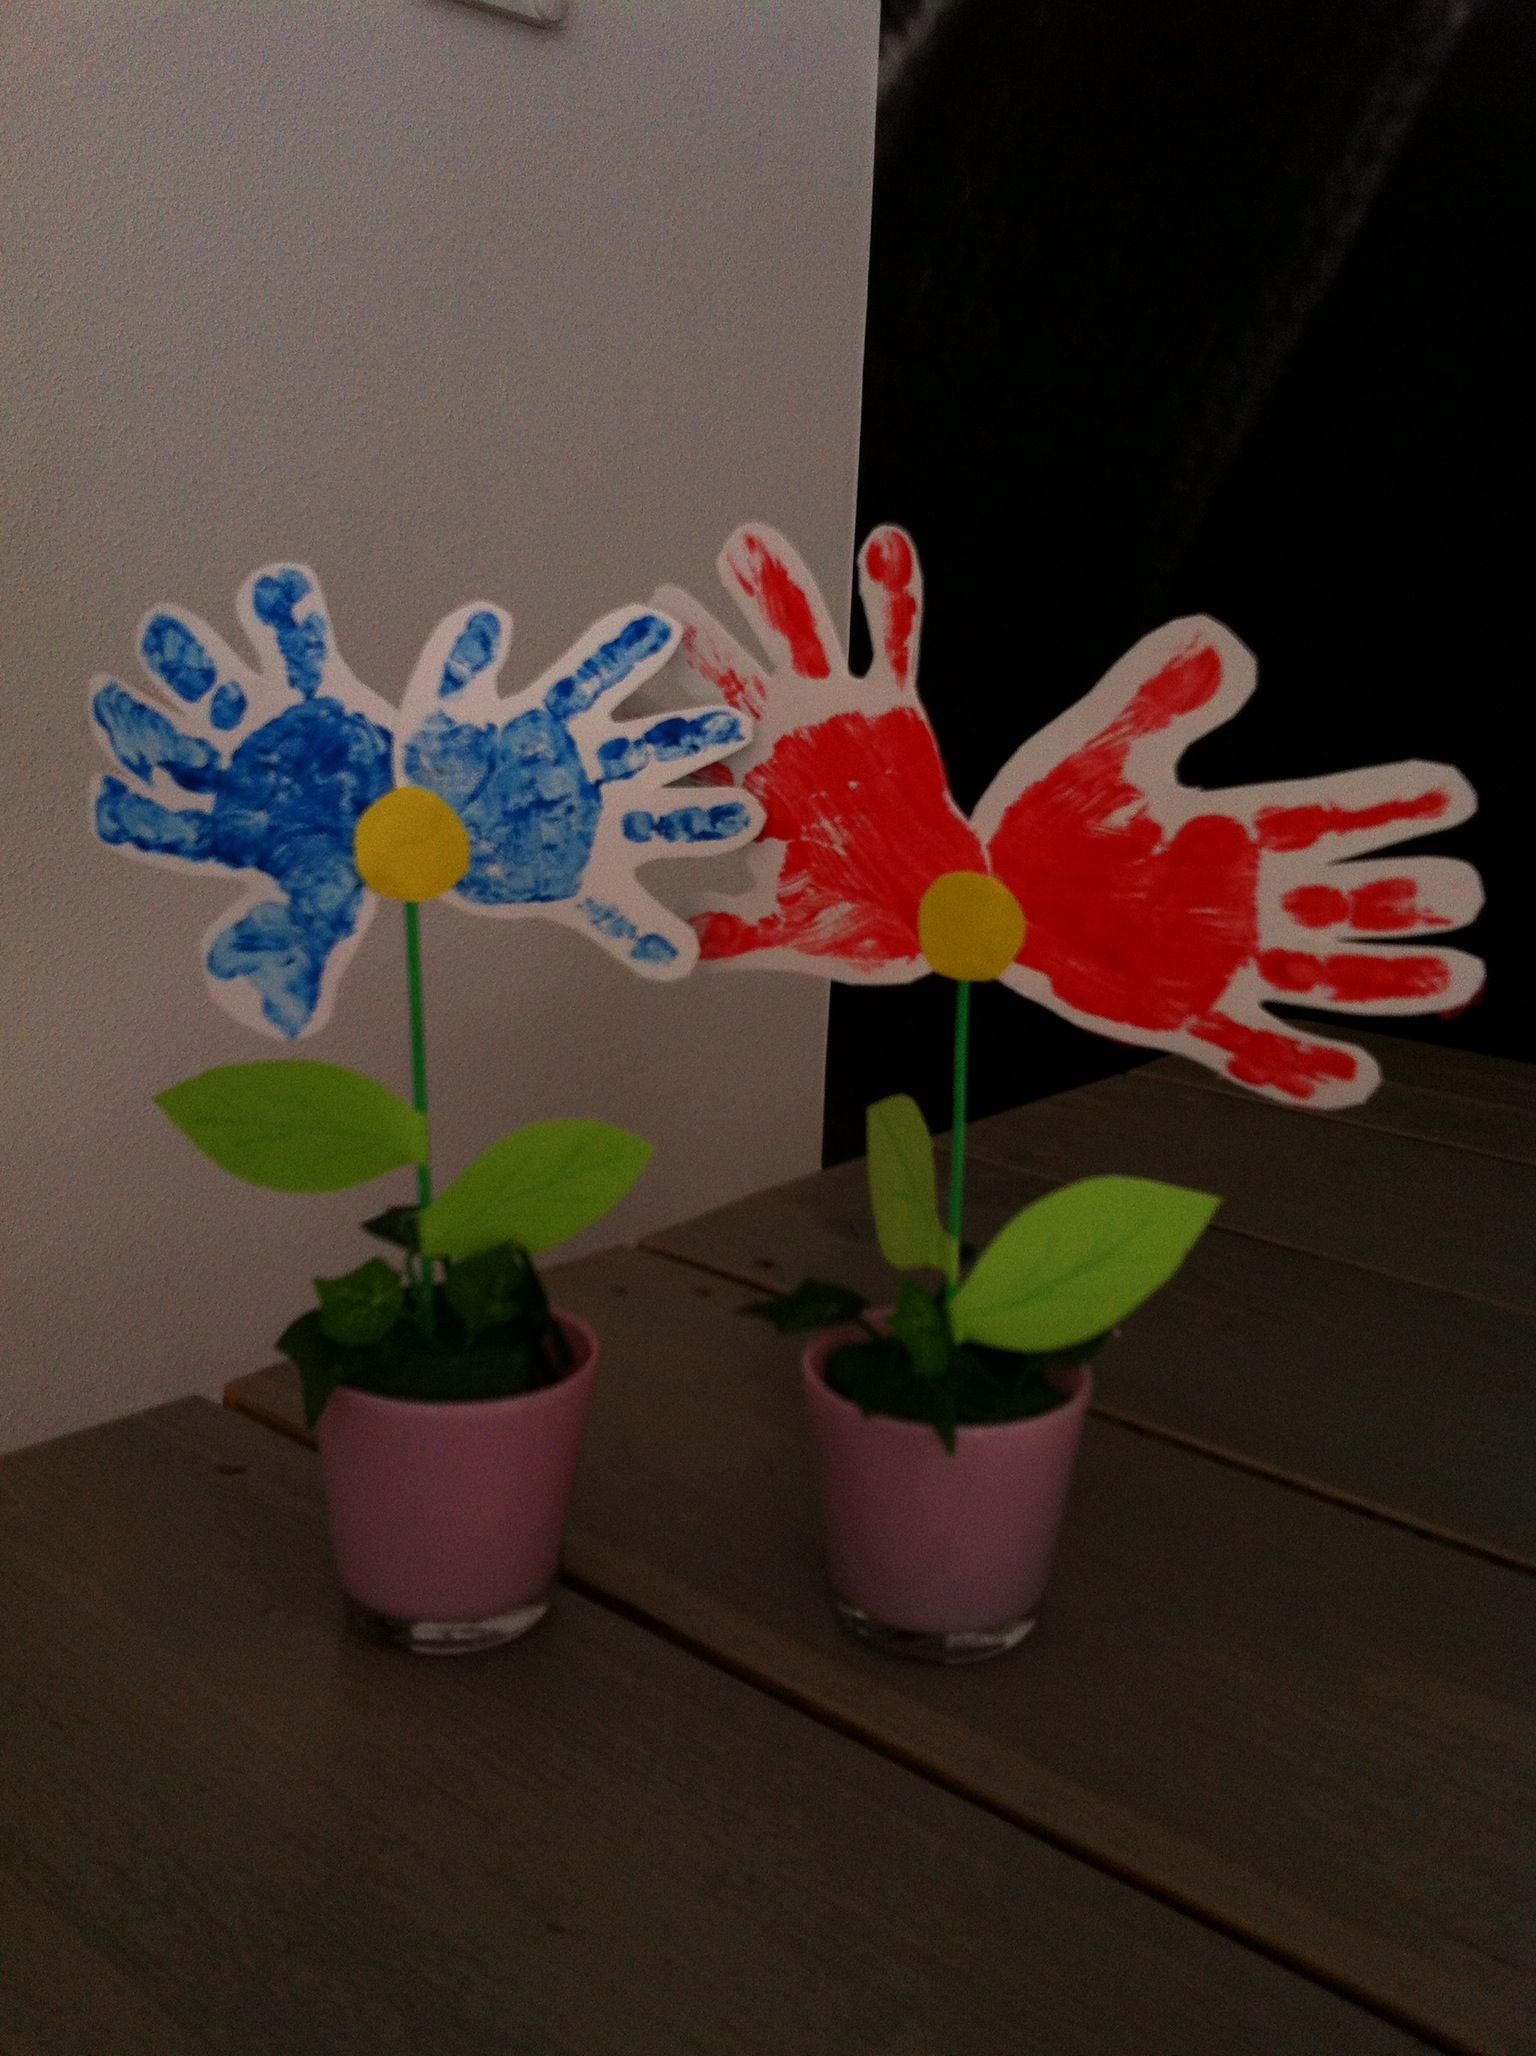 Hedendaags Knutselen met kids voor moeder/ vaderdag | Knutselen met peuters YJ-66